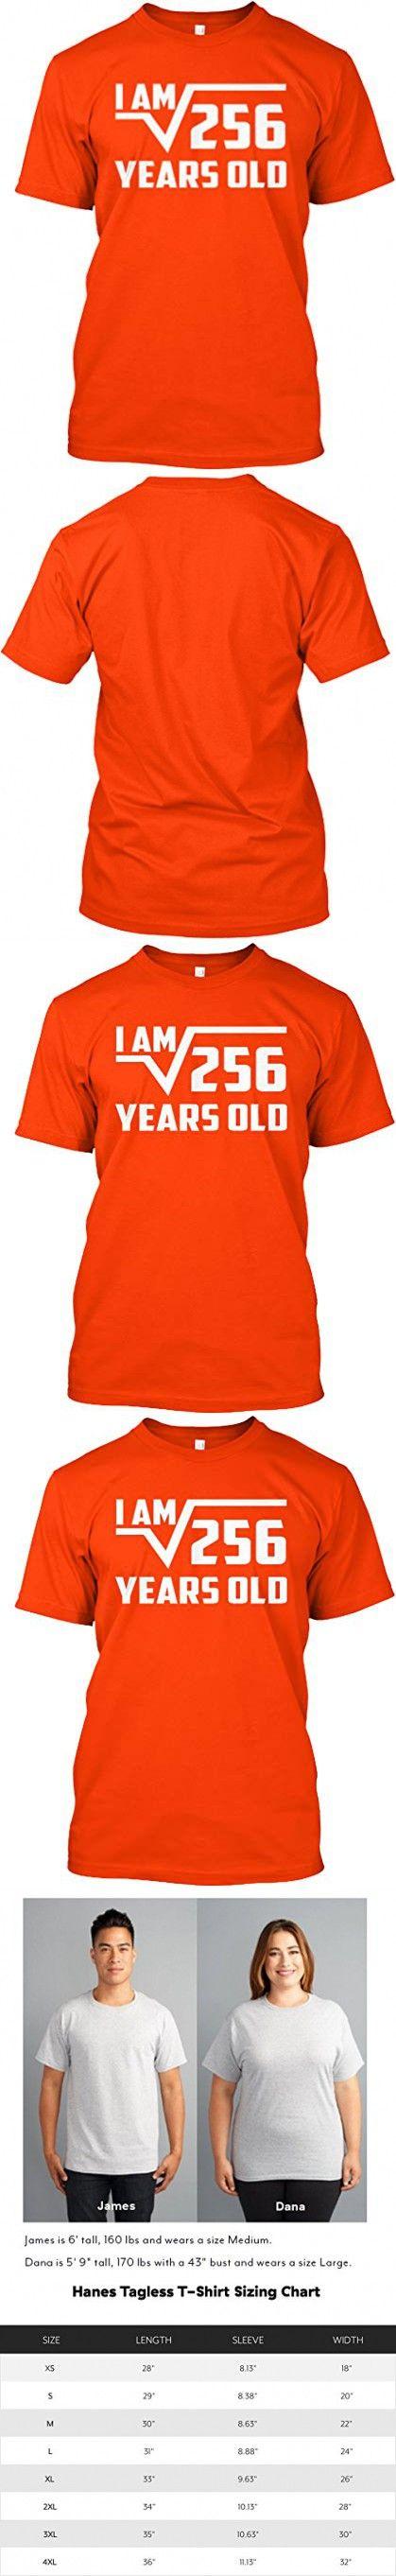 Teespring 16 Years Old 16th Birthday Gift Ideas For Men Women Boy Girl